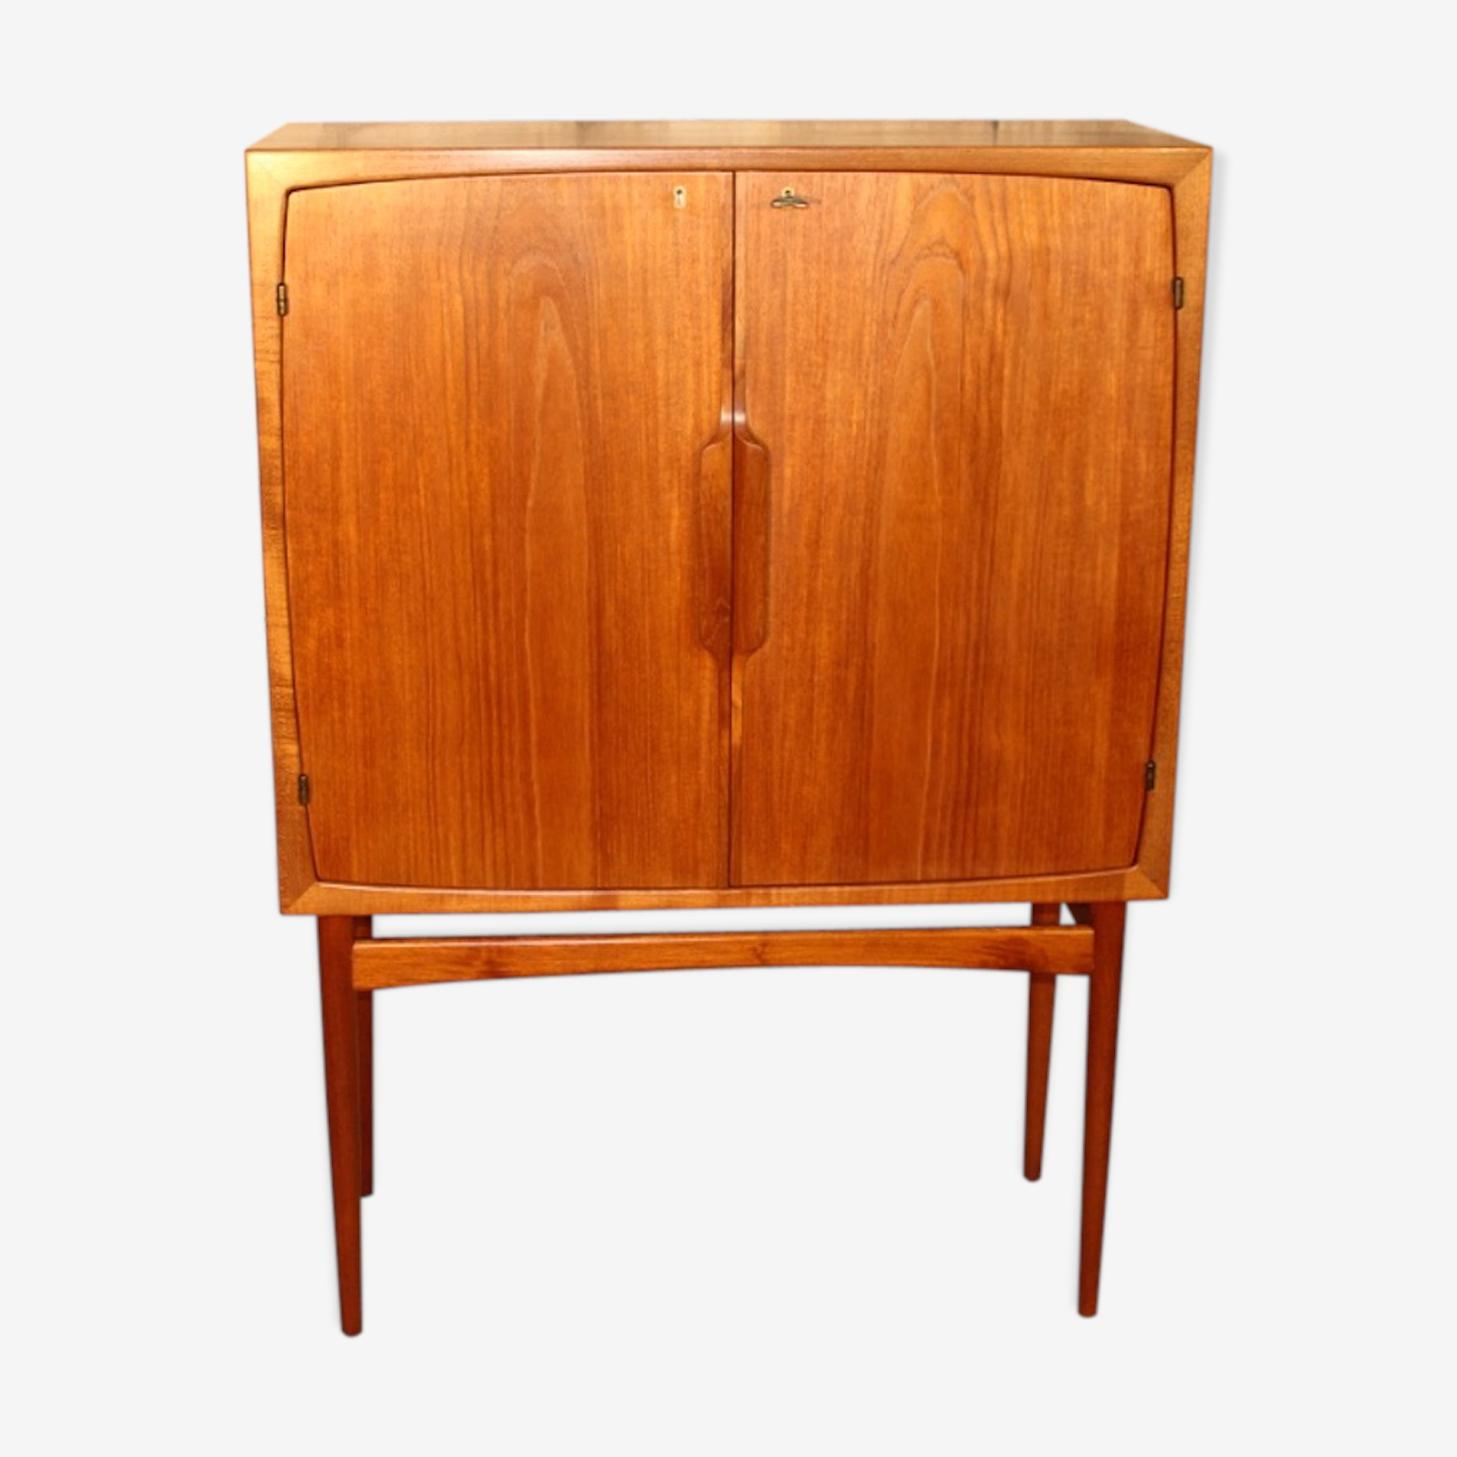 "Bar vintage scandinave en teck modèle ""Bacchus"" par Torbjorn Afdal pour Mellemstrands Mobelfabrik, années 1960"